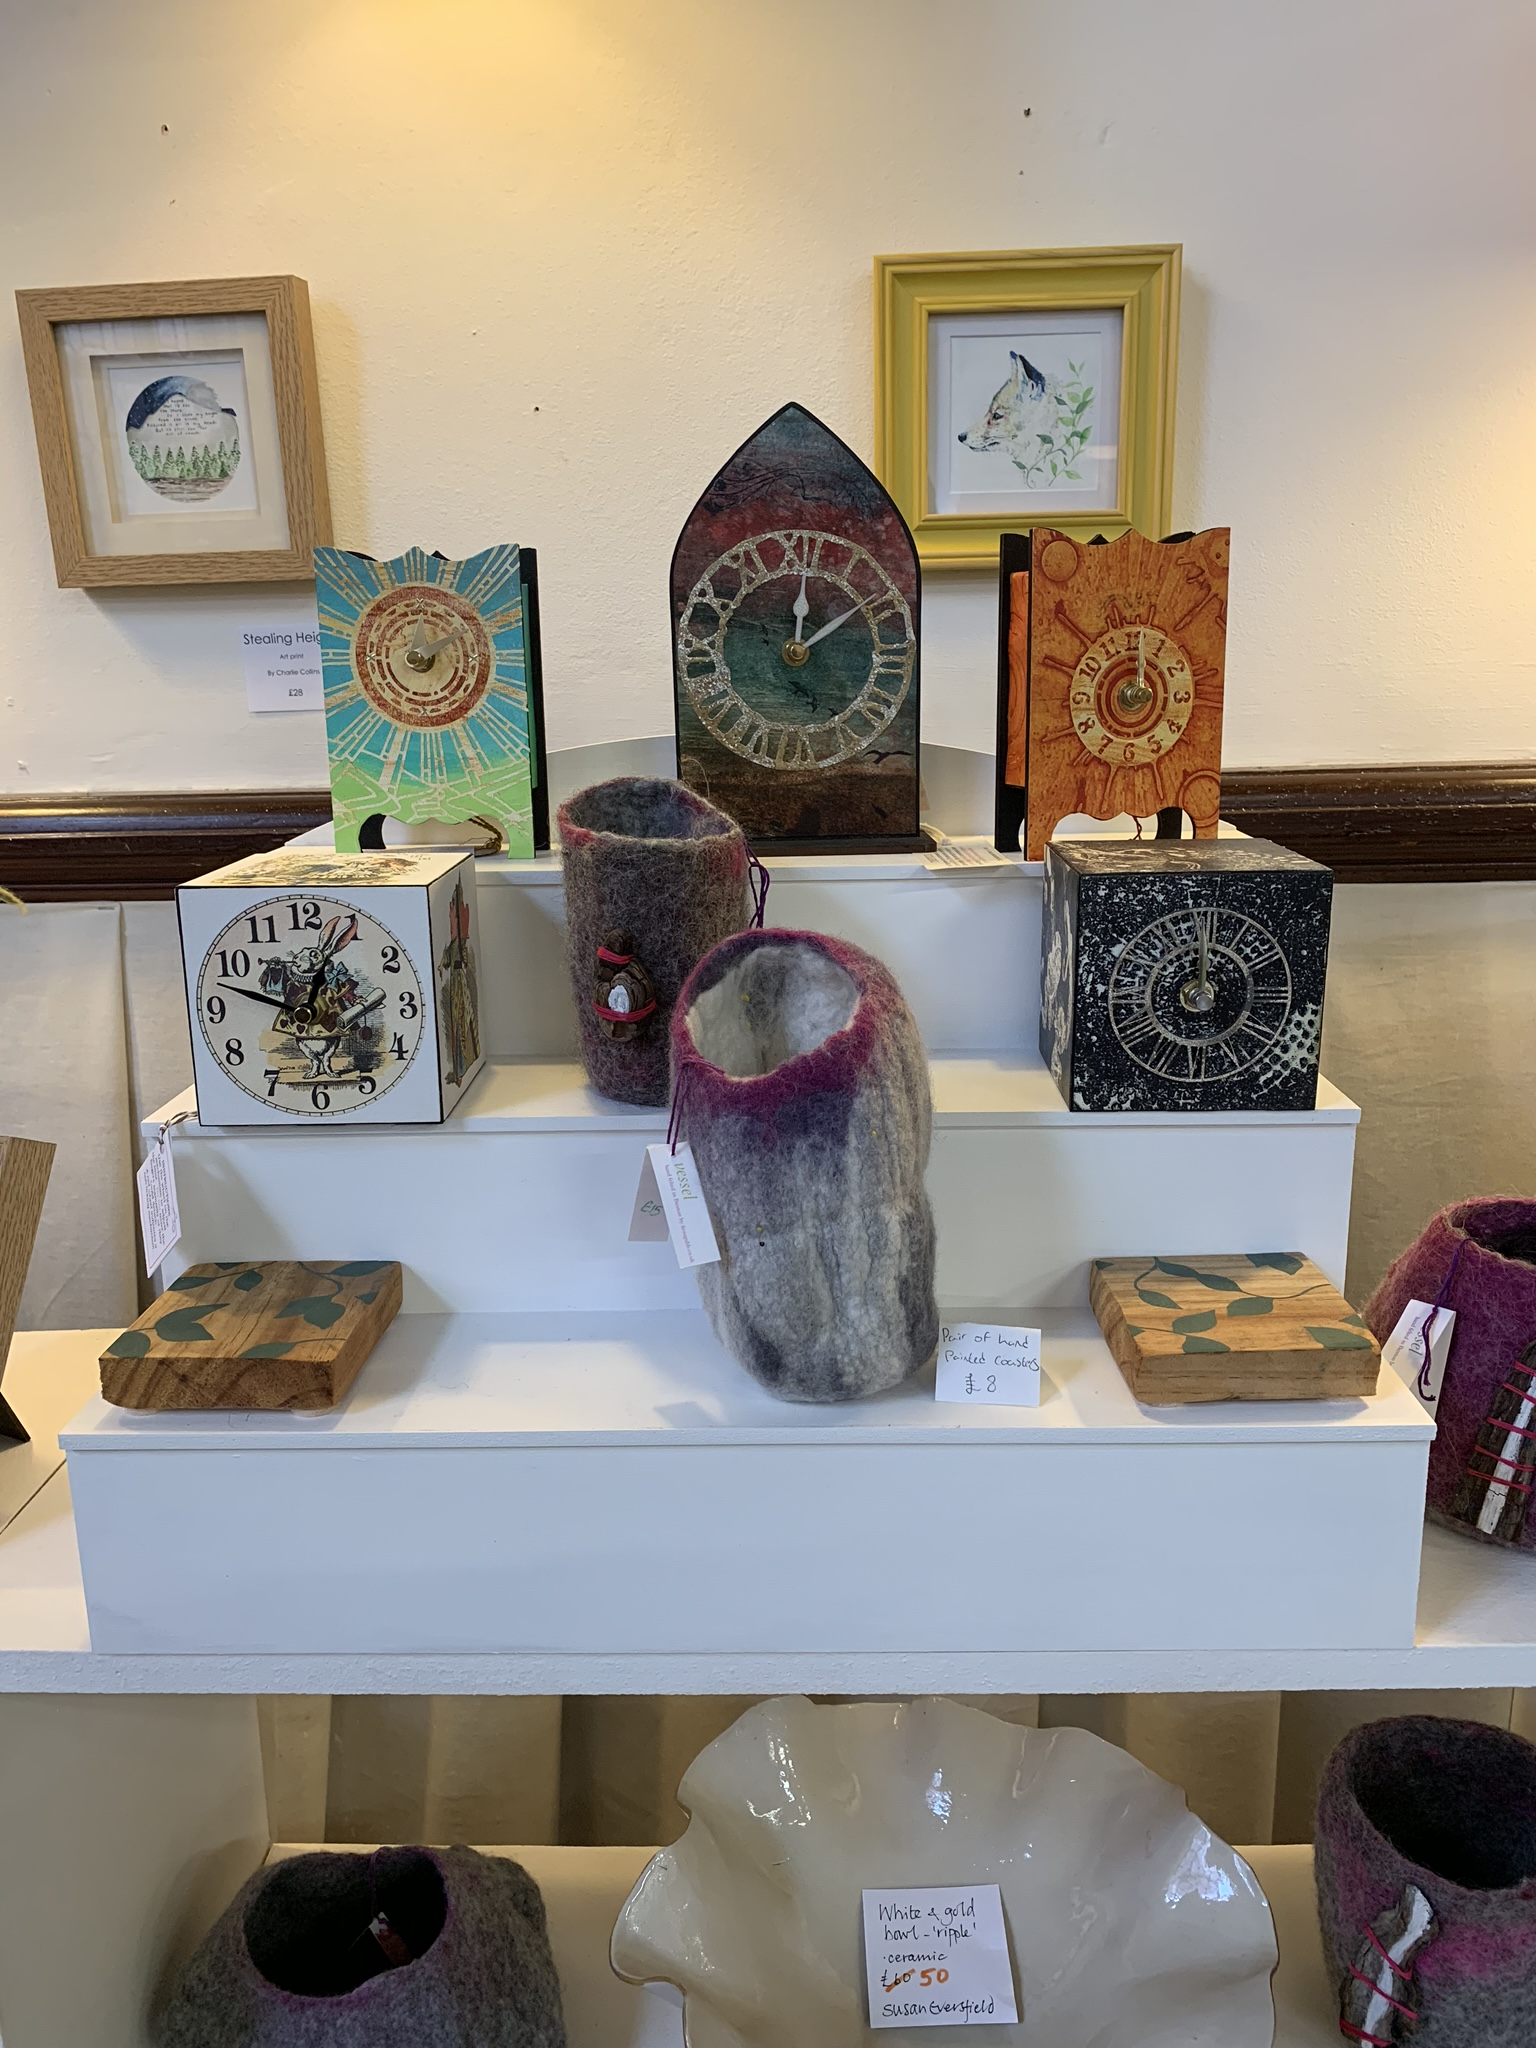 Ceramics and clocks